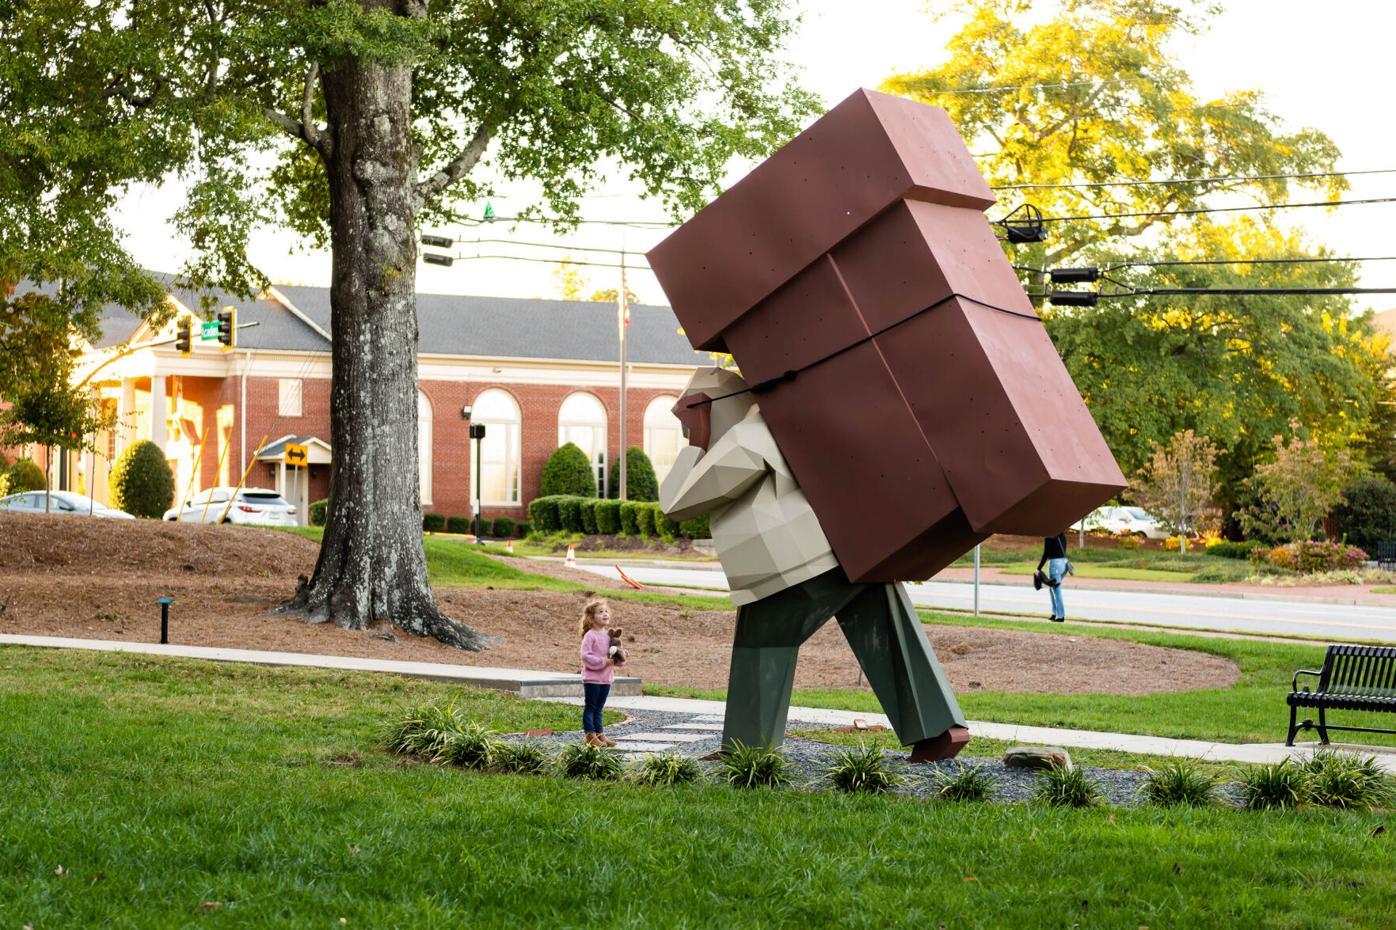 Laborer Sculpture